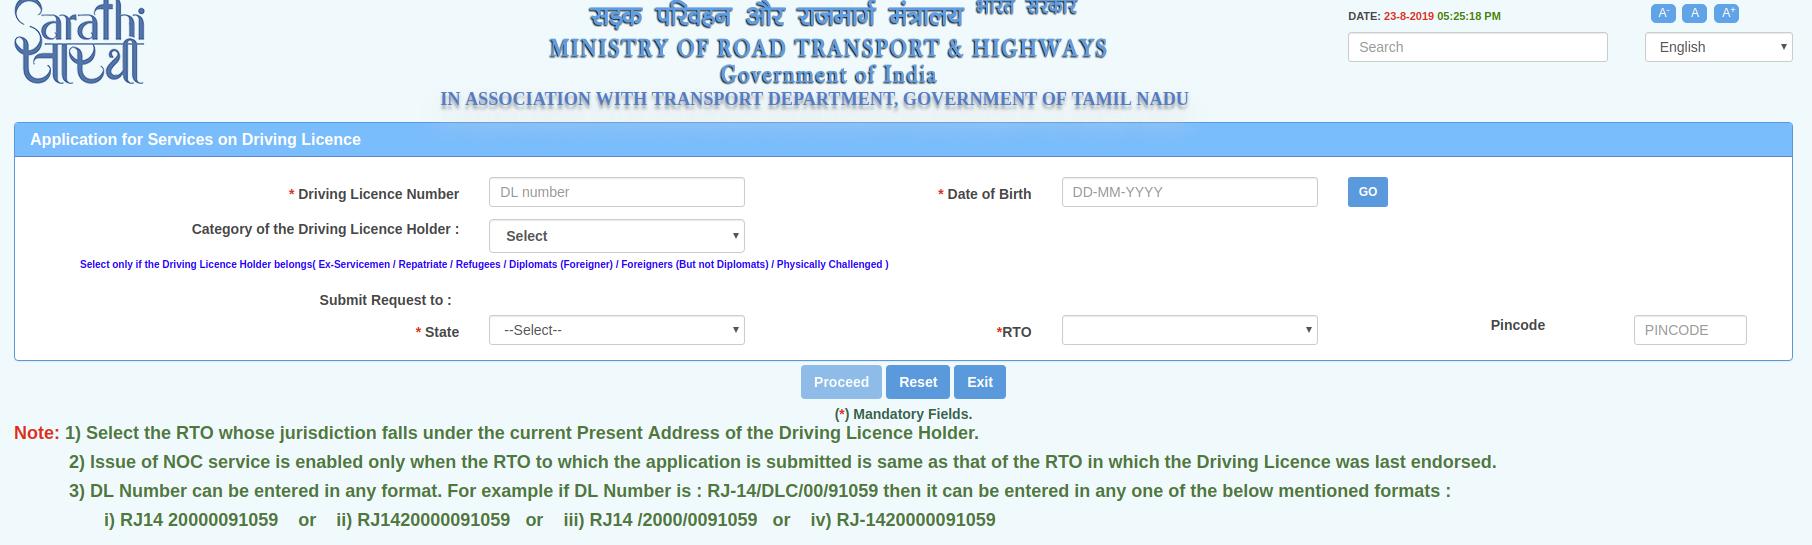 Driving Licence Renewal - Image 4